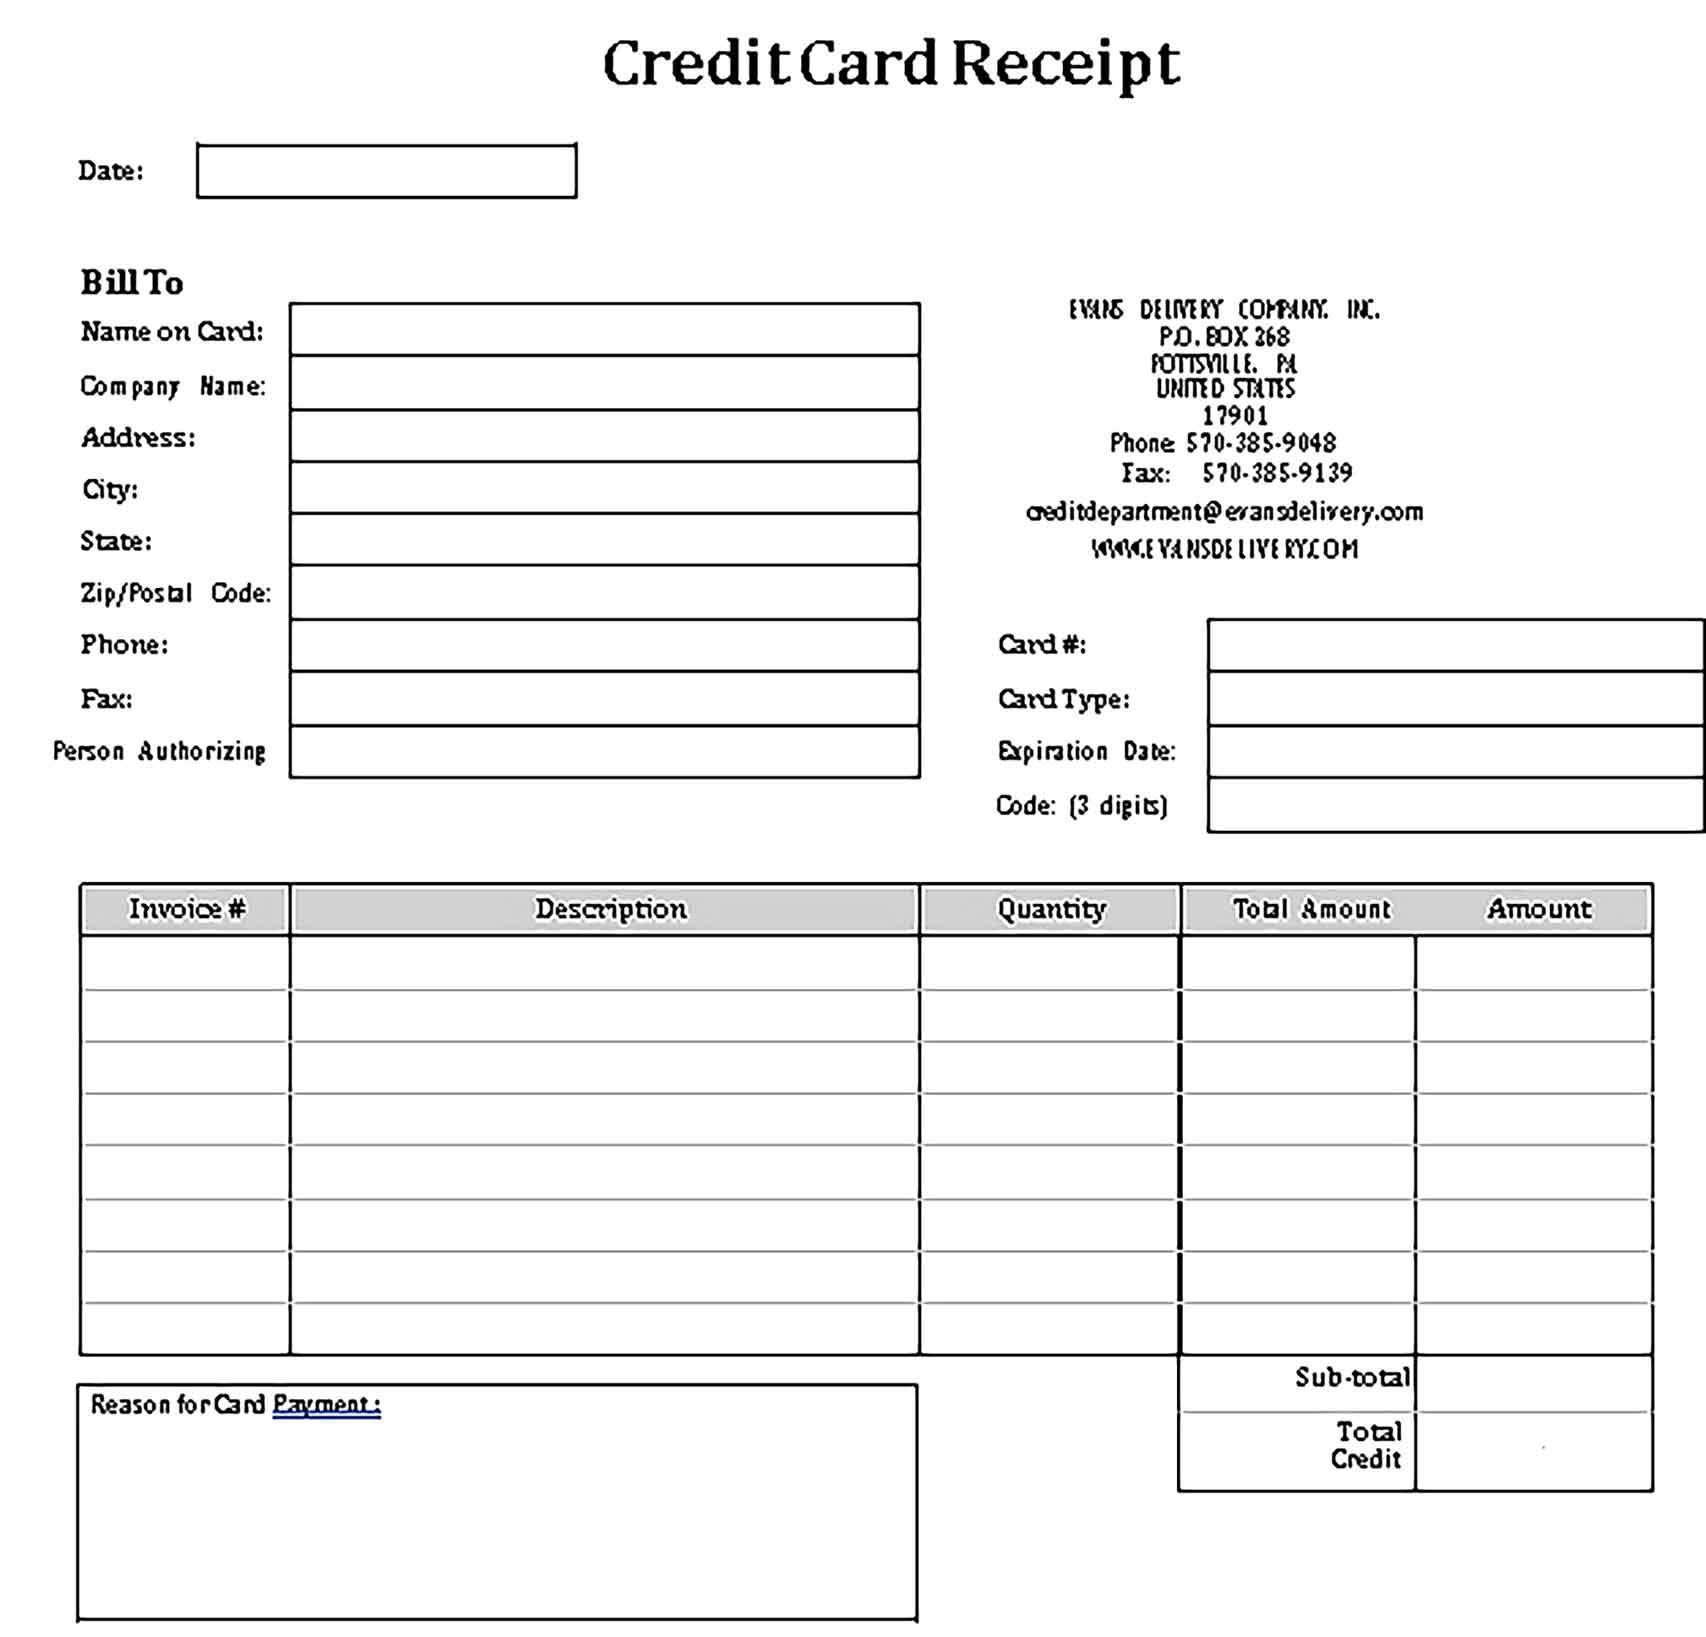 Credit Card Receipts Sample